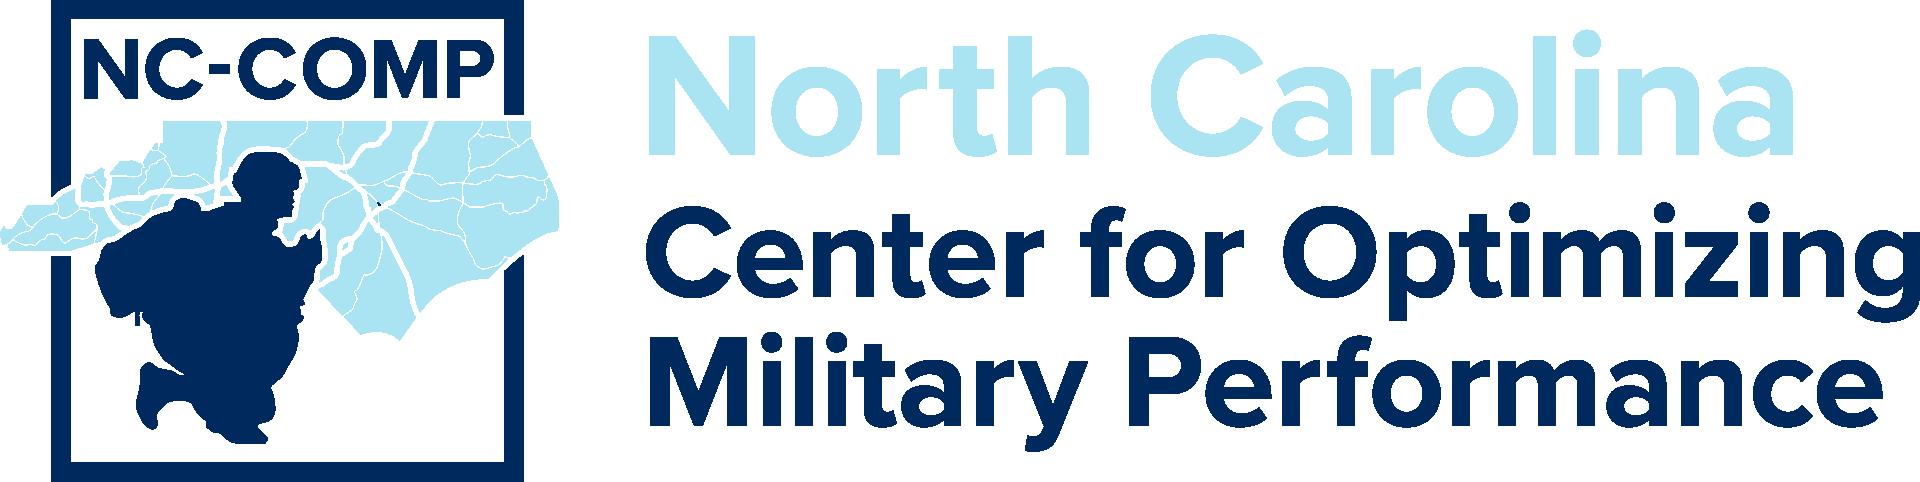 North Carolina Center for Optimizing Military Performance logo